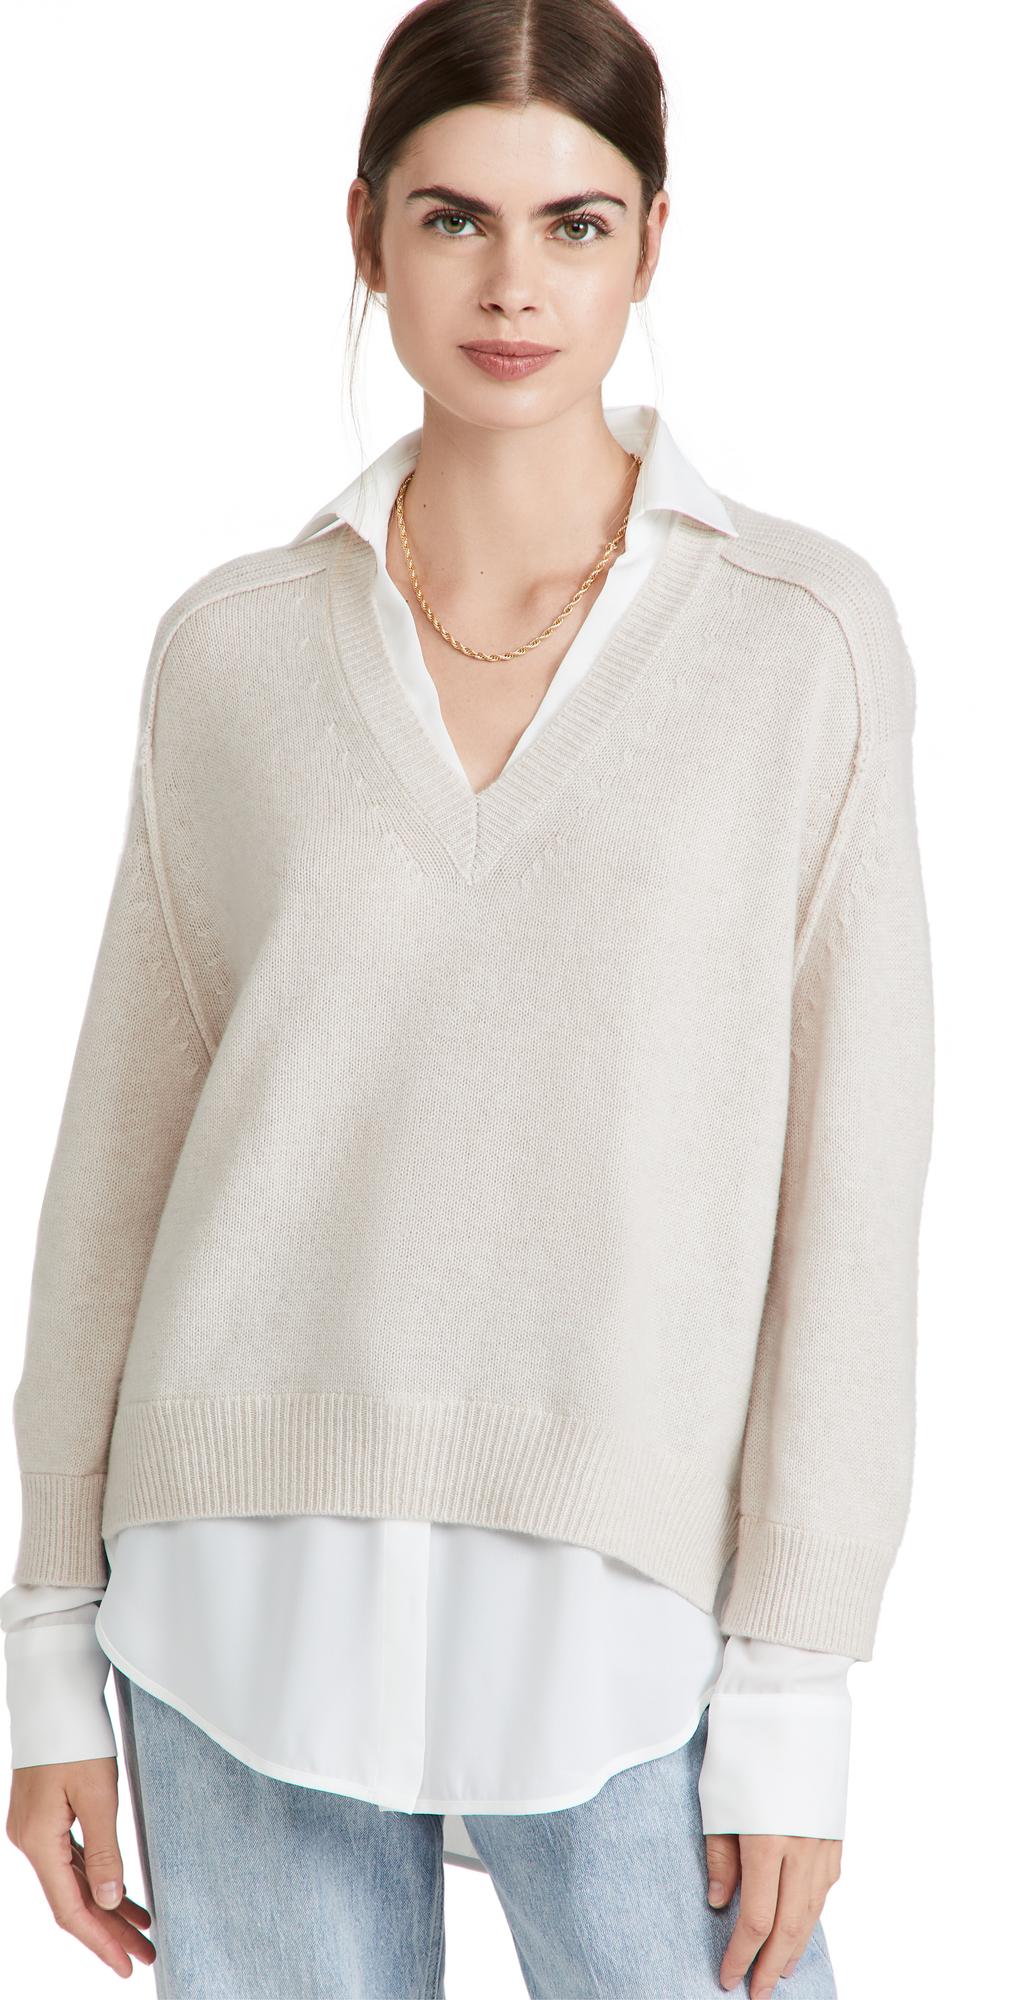 V-Neck Layered Pullover